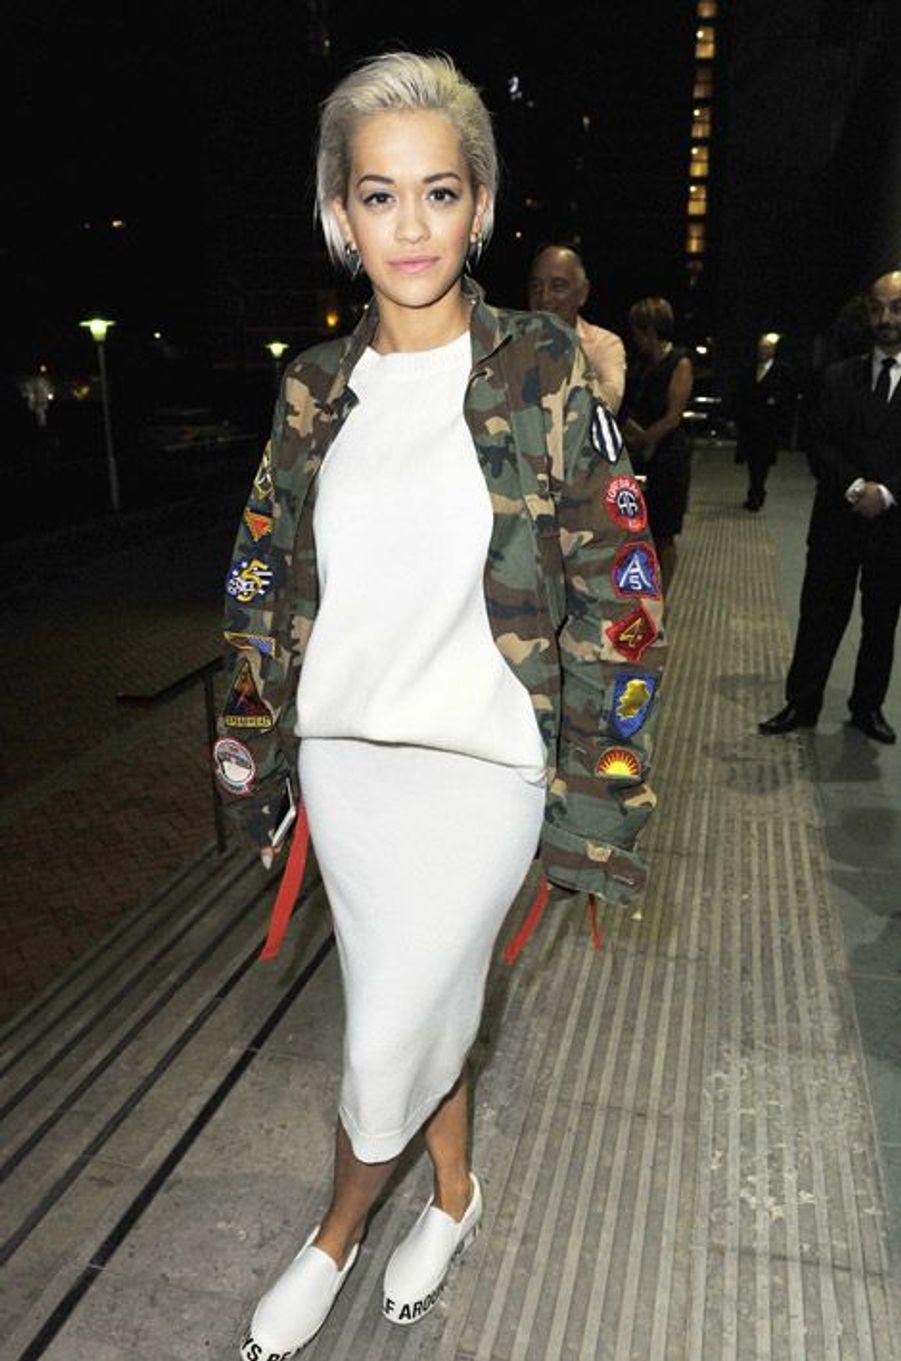 La chanteuse Rita Ora à Manchester, le 3 octobre 2014